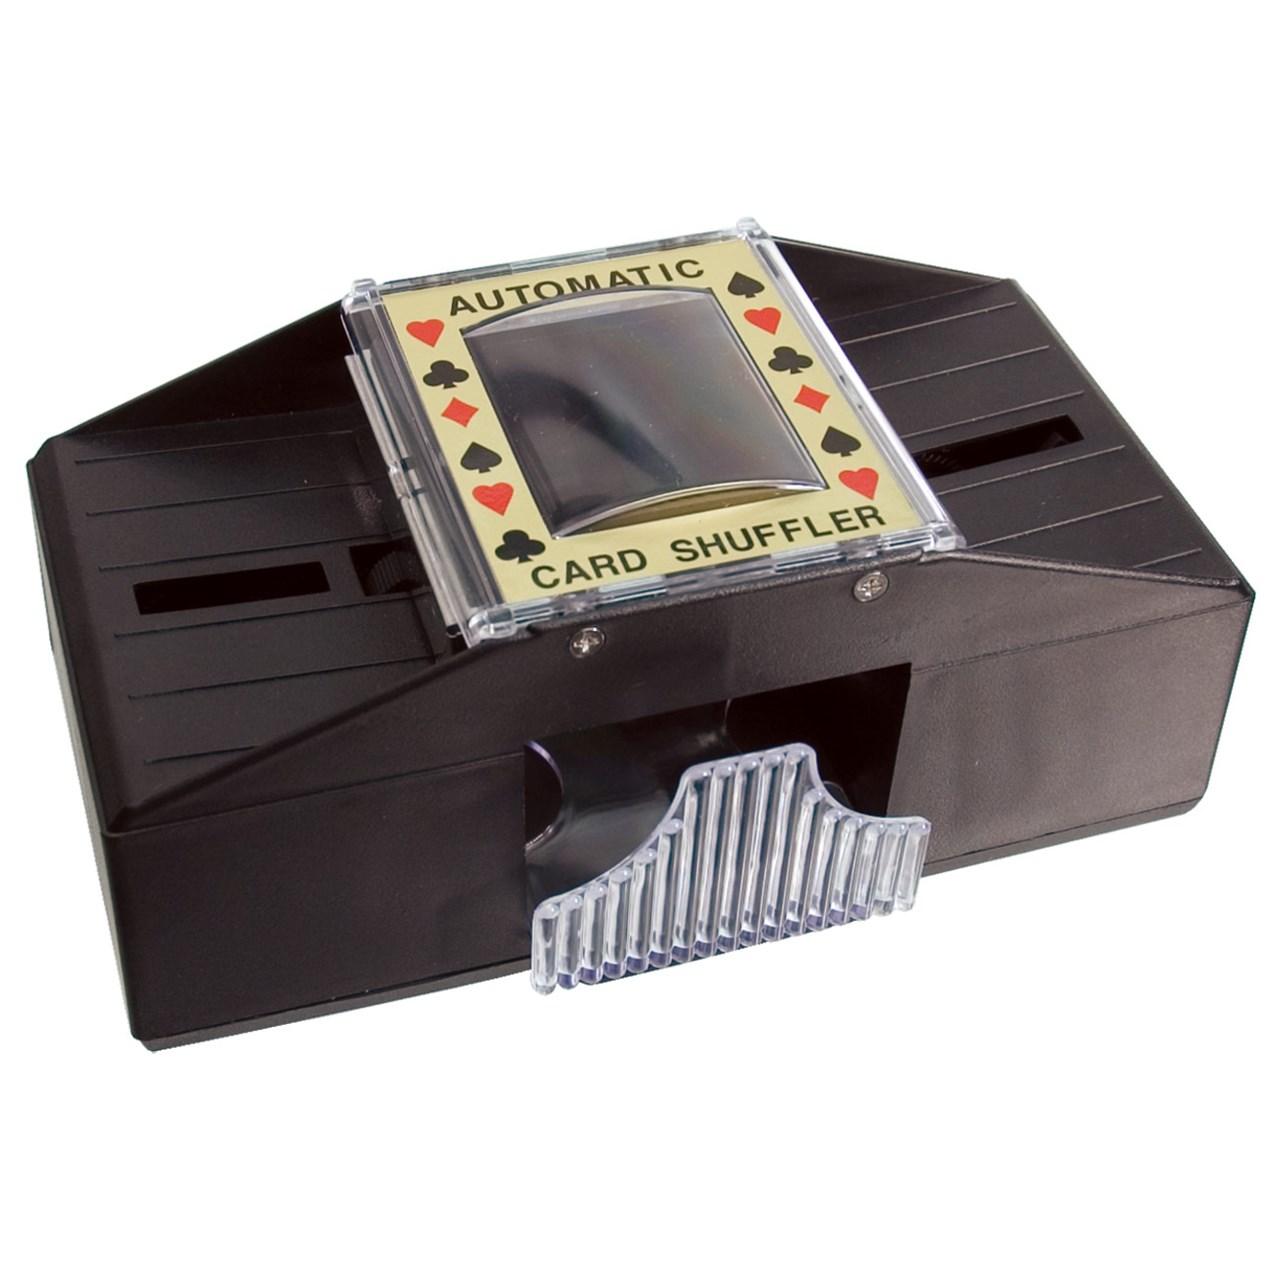 Maxiaids Automatic Card Shuffler